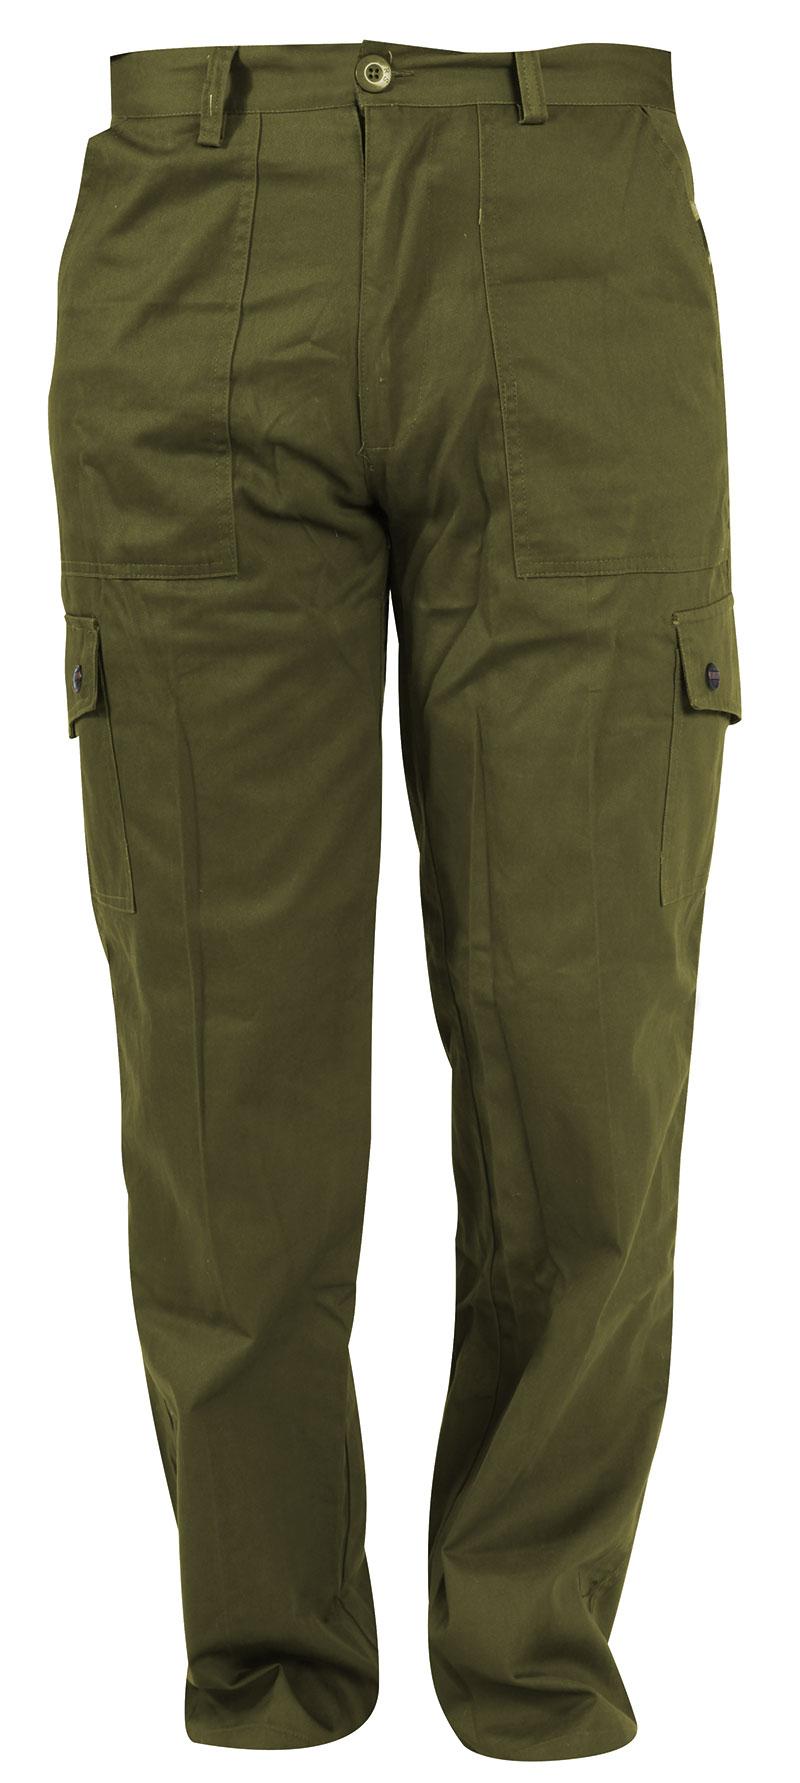 Спортивные брюки Norfin Nature, khaki, 3XL INT